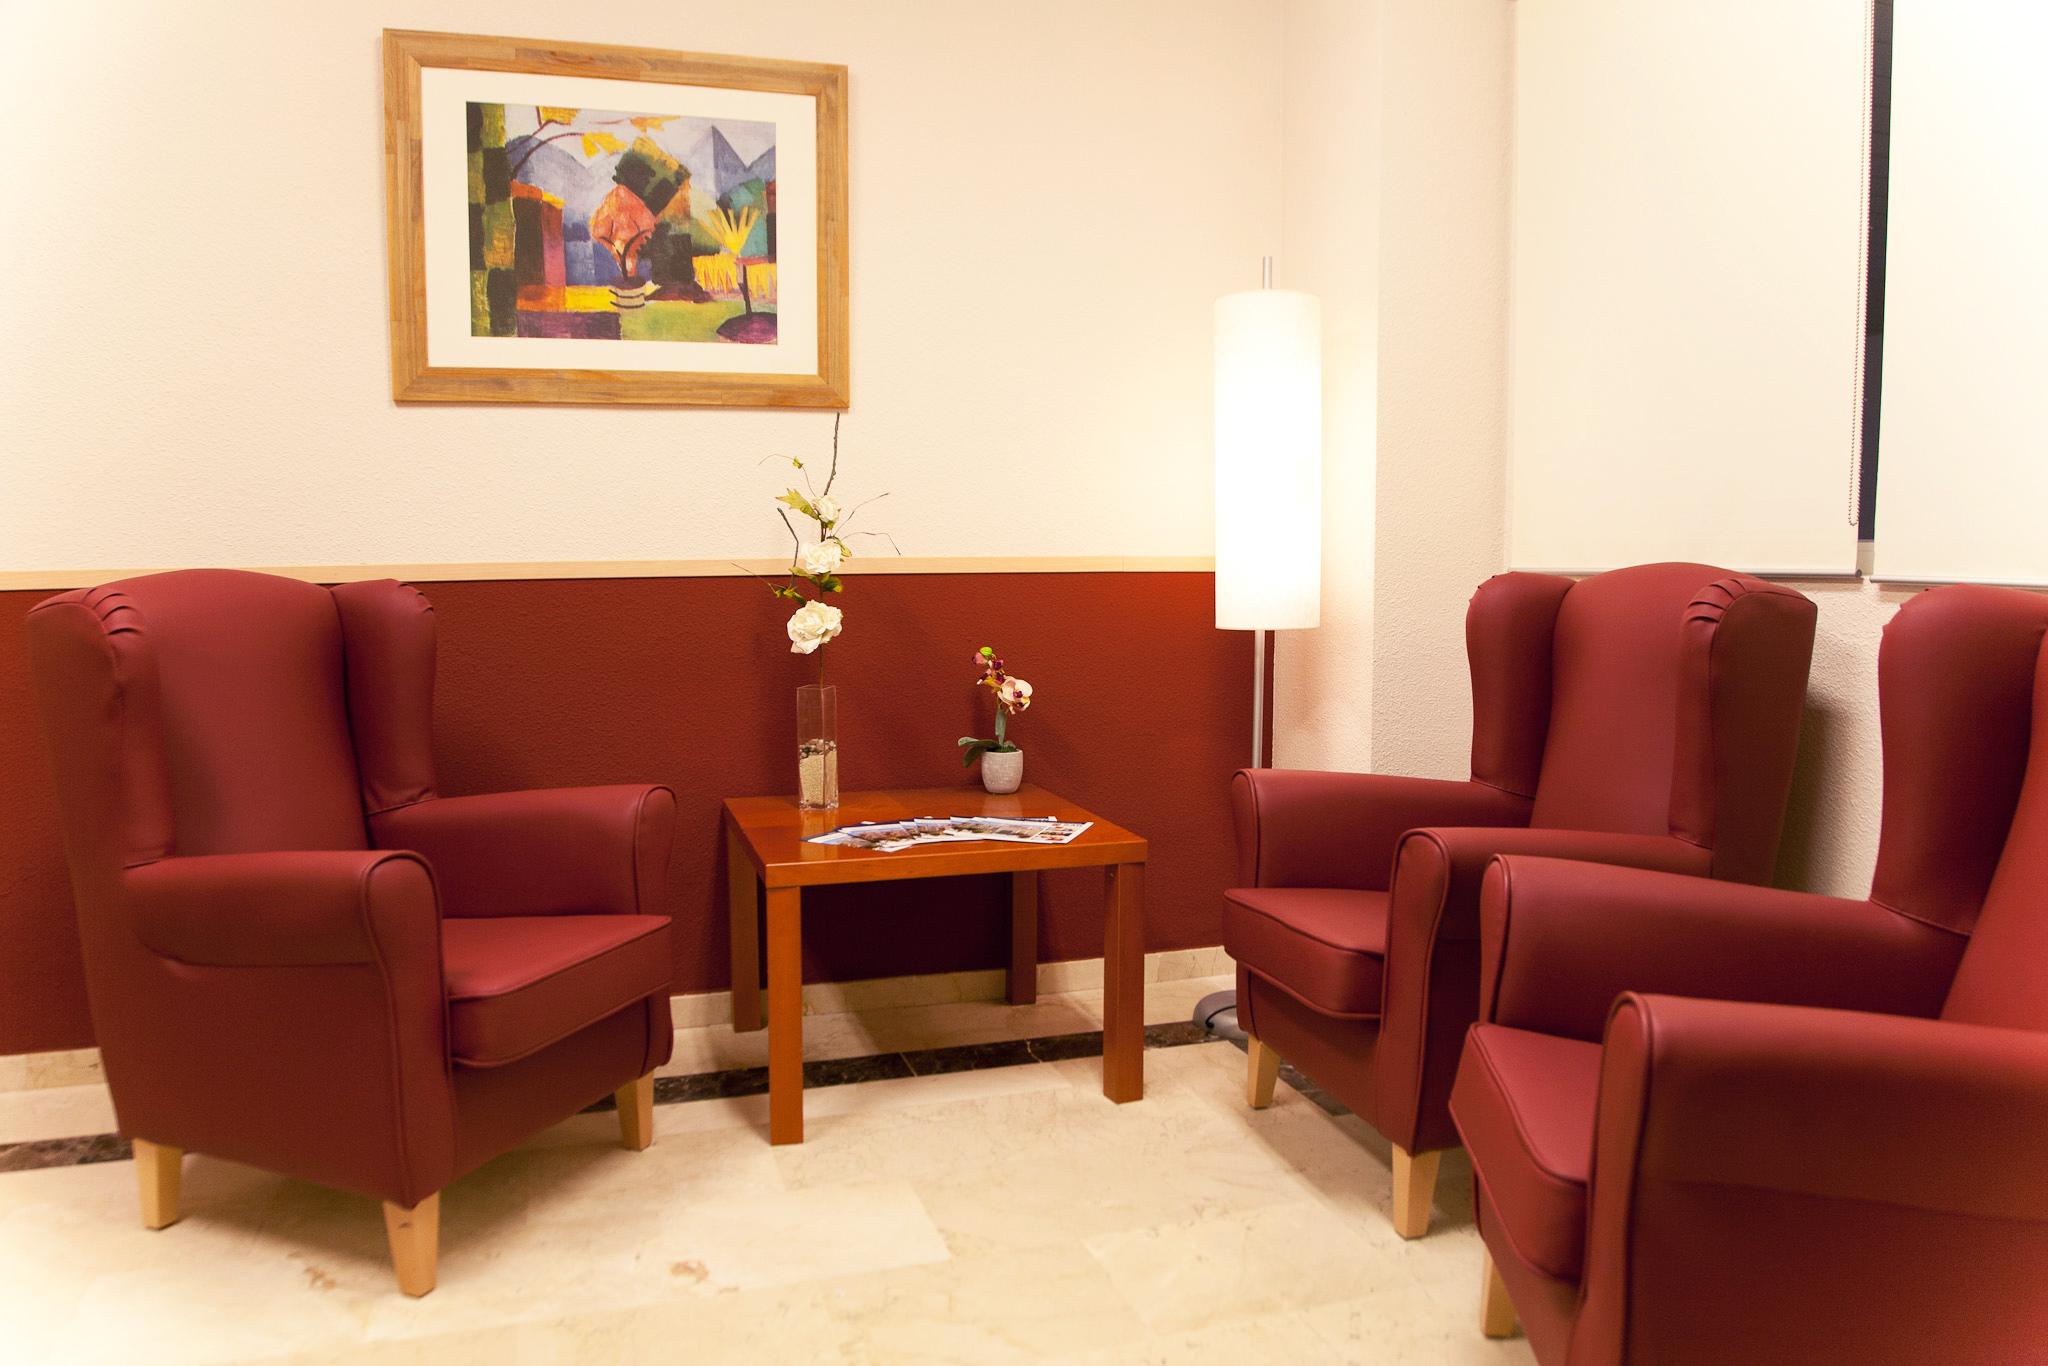 Salita residencia de ancianos SARquavitae Parque Gavilanes